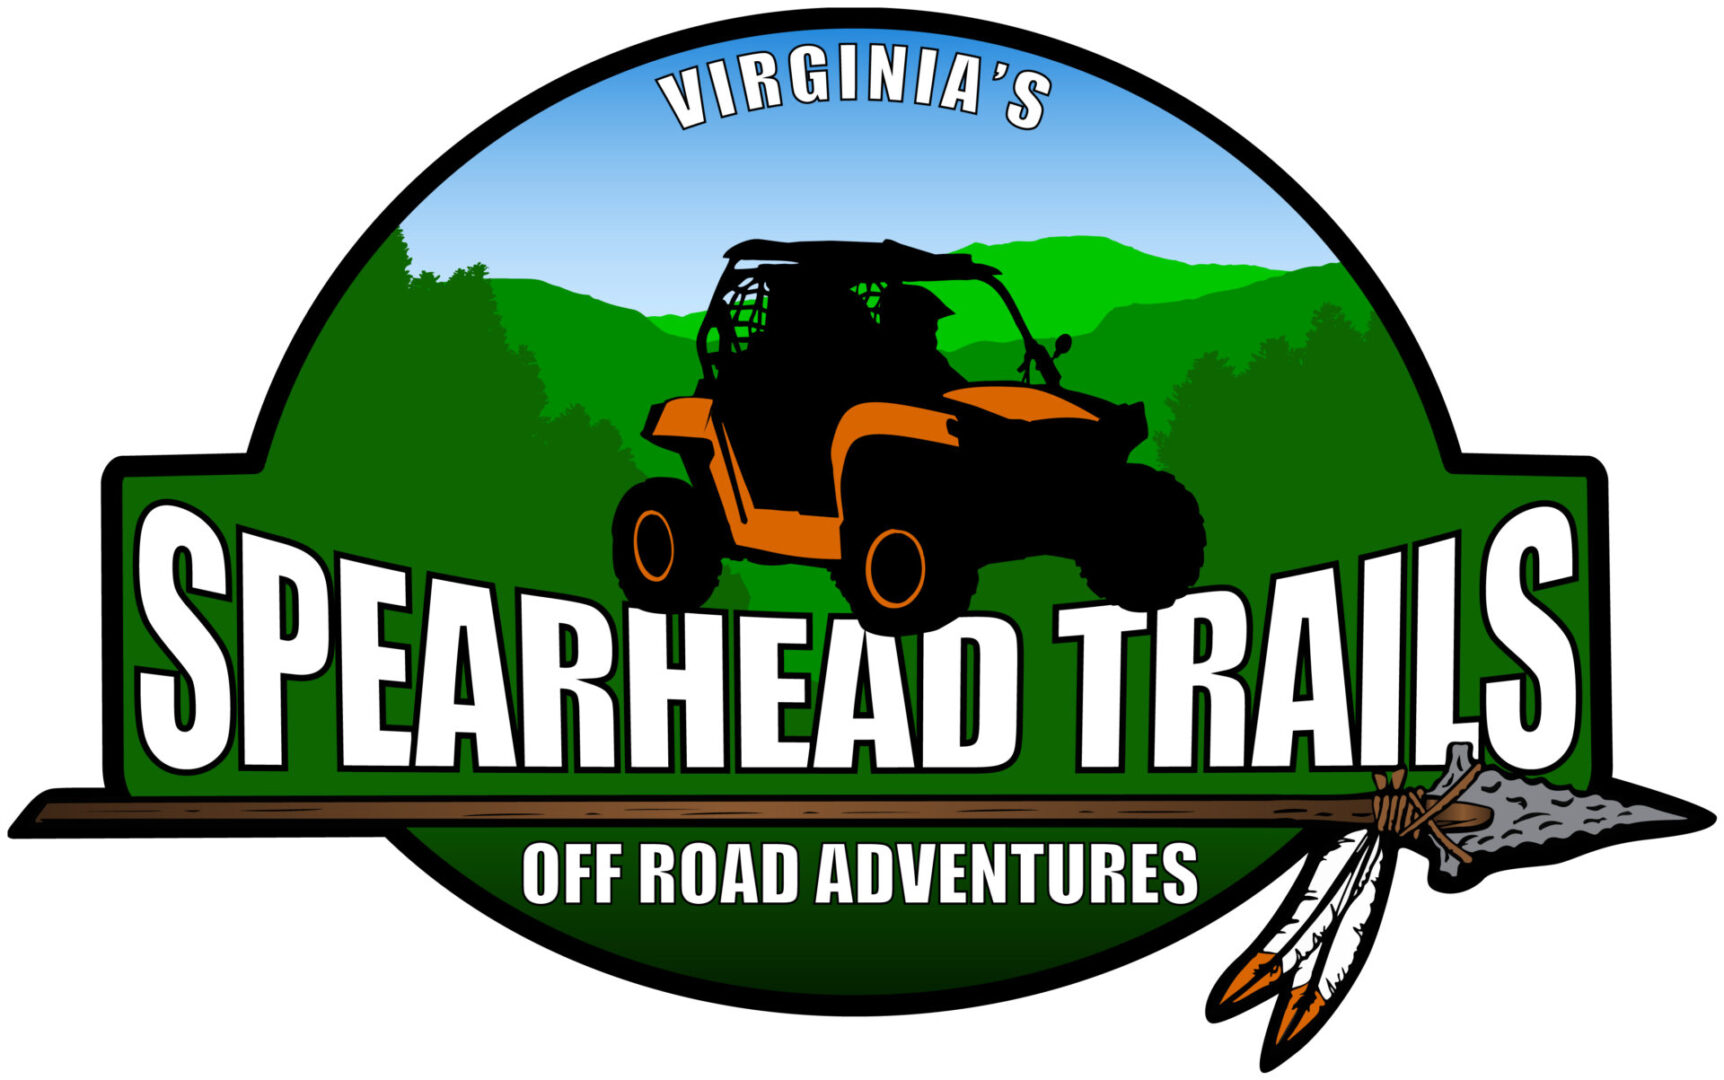 https://spearheadtrails.com/wp-content/uploads/2020/05/Motorized-Division-Logo-scaled.jpg